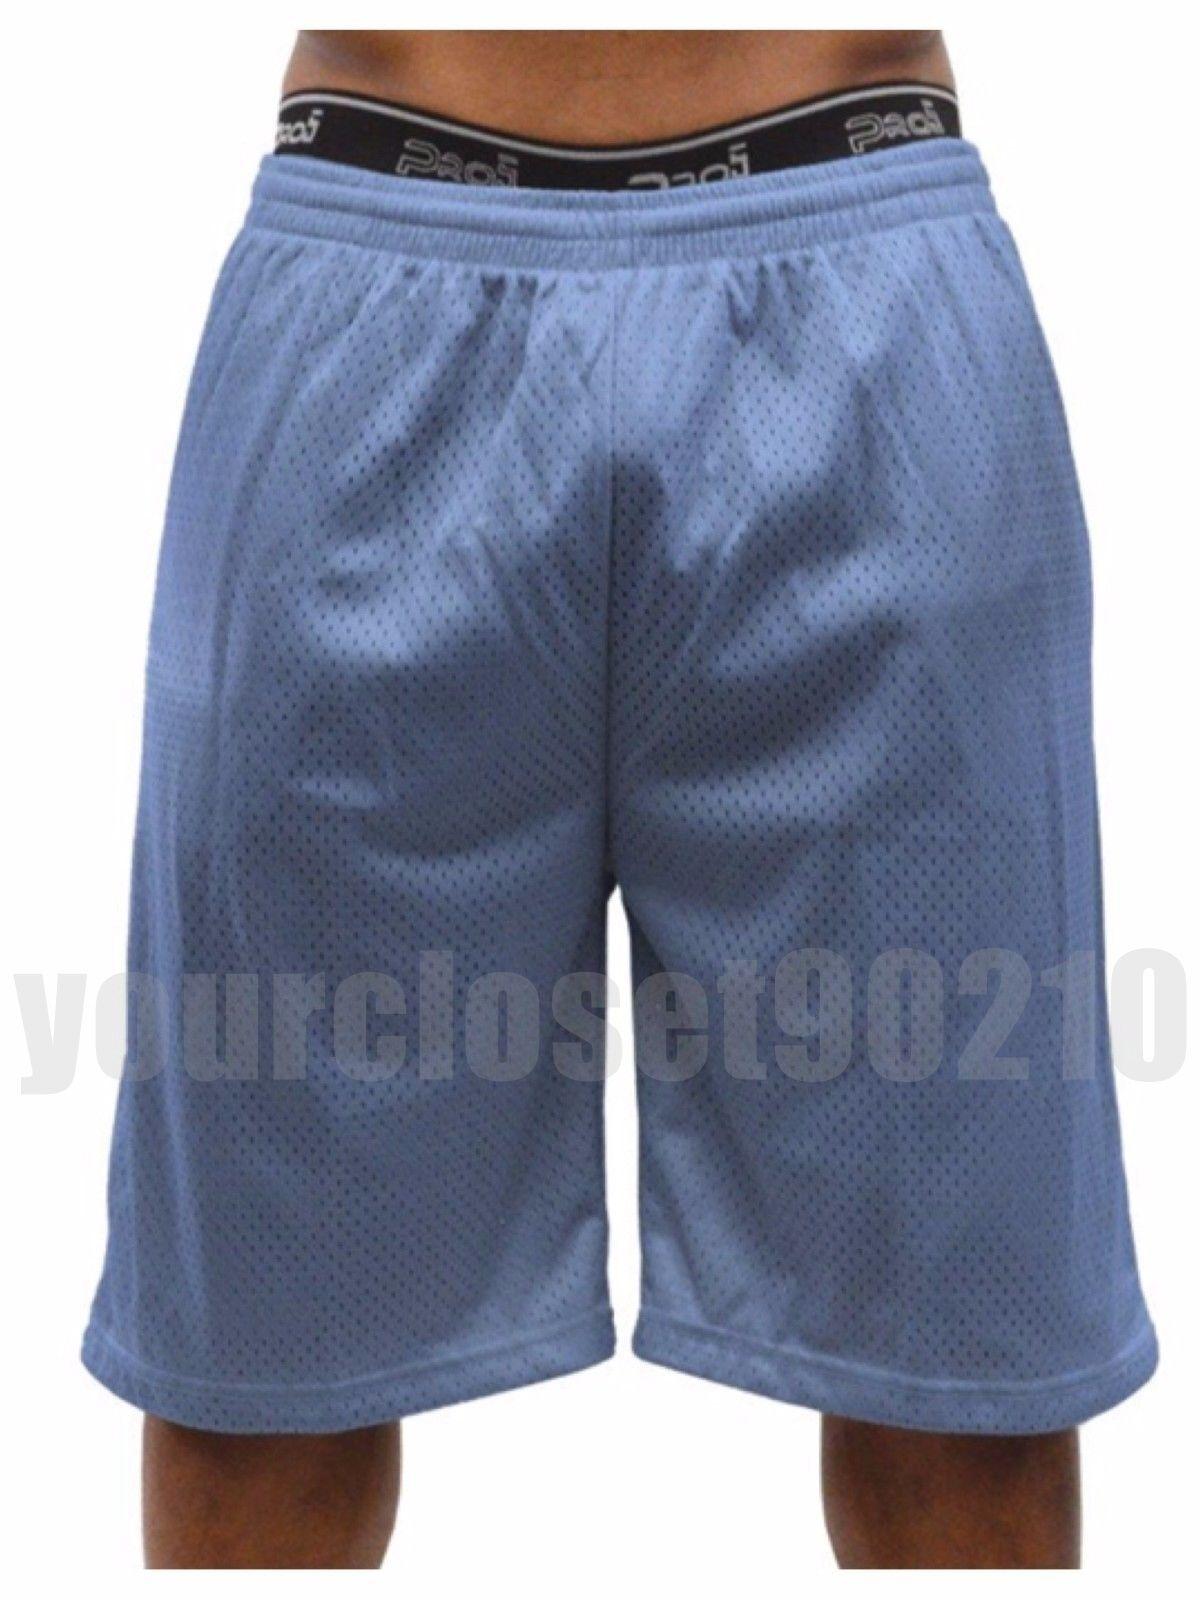 Mens Dri-Fit Mesh Shorts Fitness Workout Gym Basketball Jogger Shorts Size S-5X